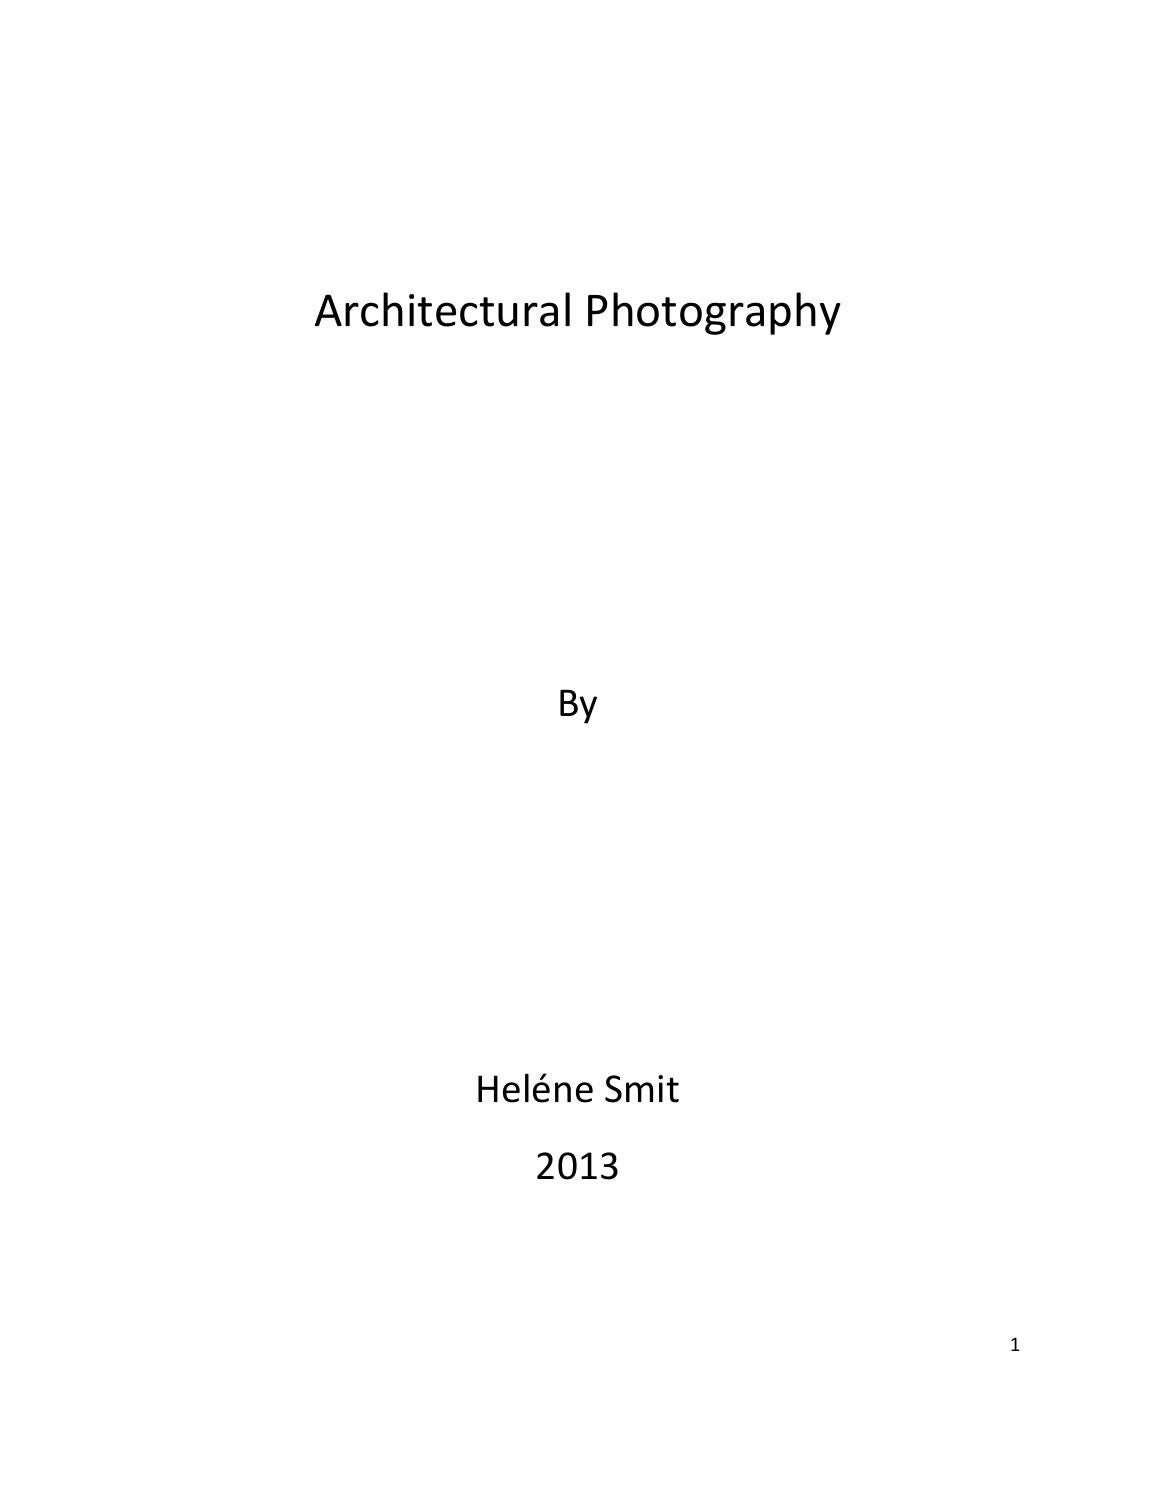 Fine Architecture Photography Dissertation Classics Oak Ridge To